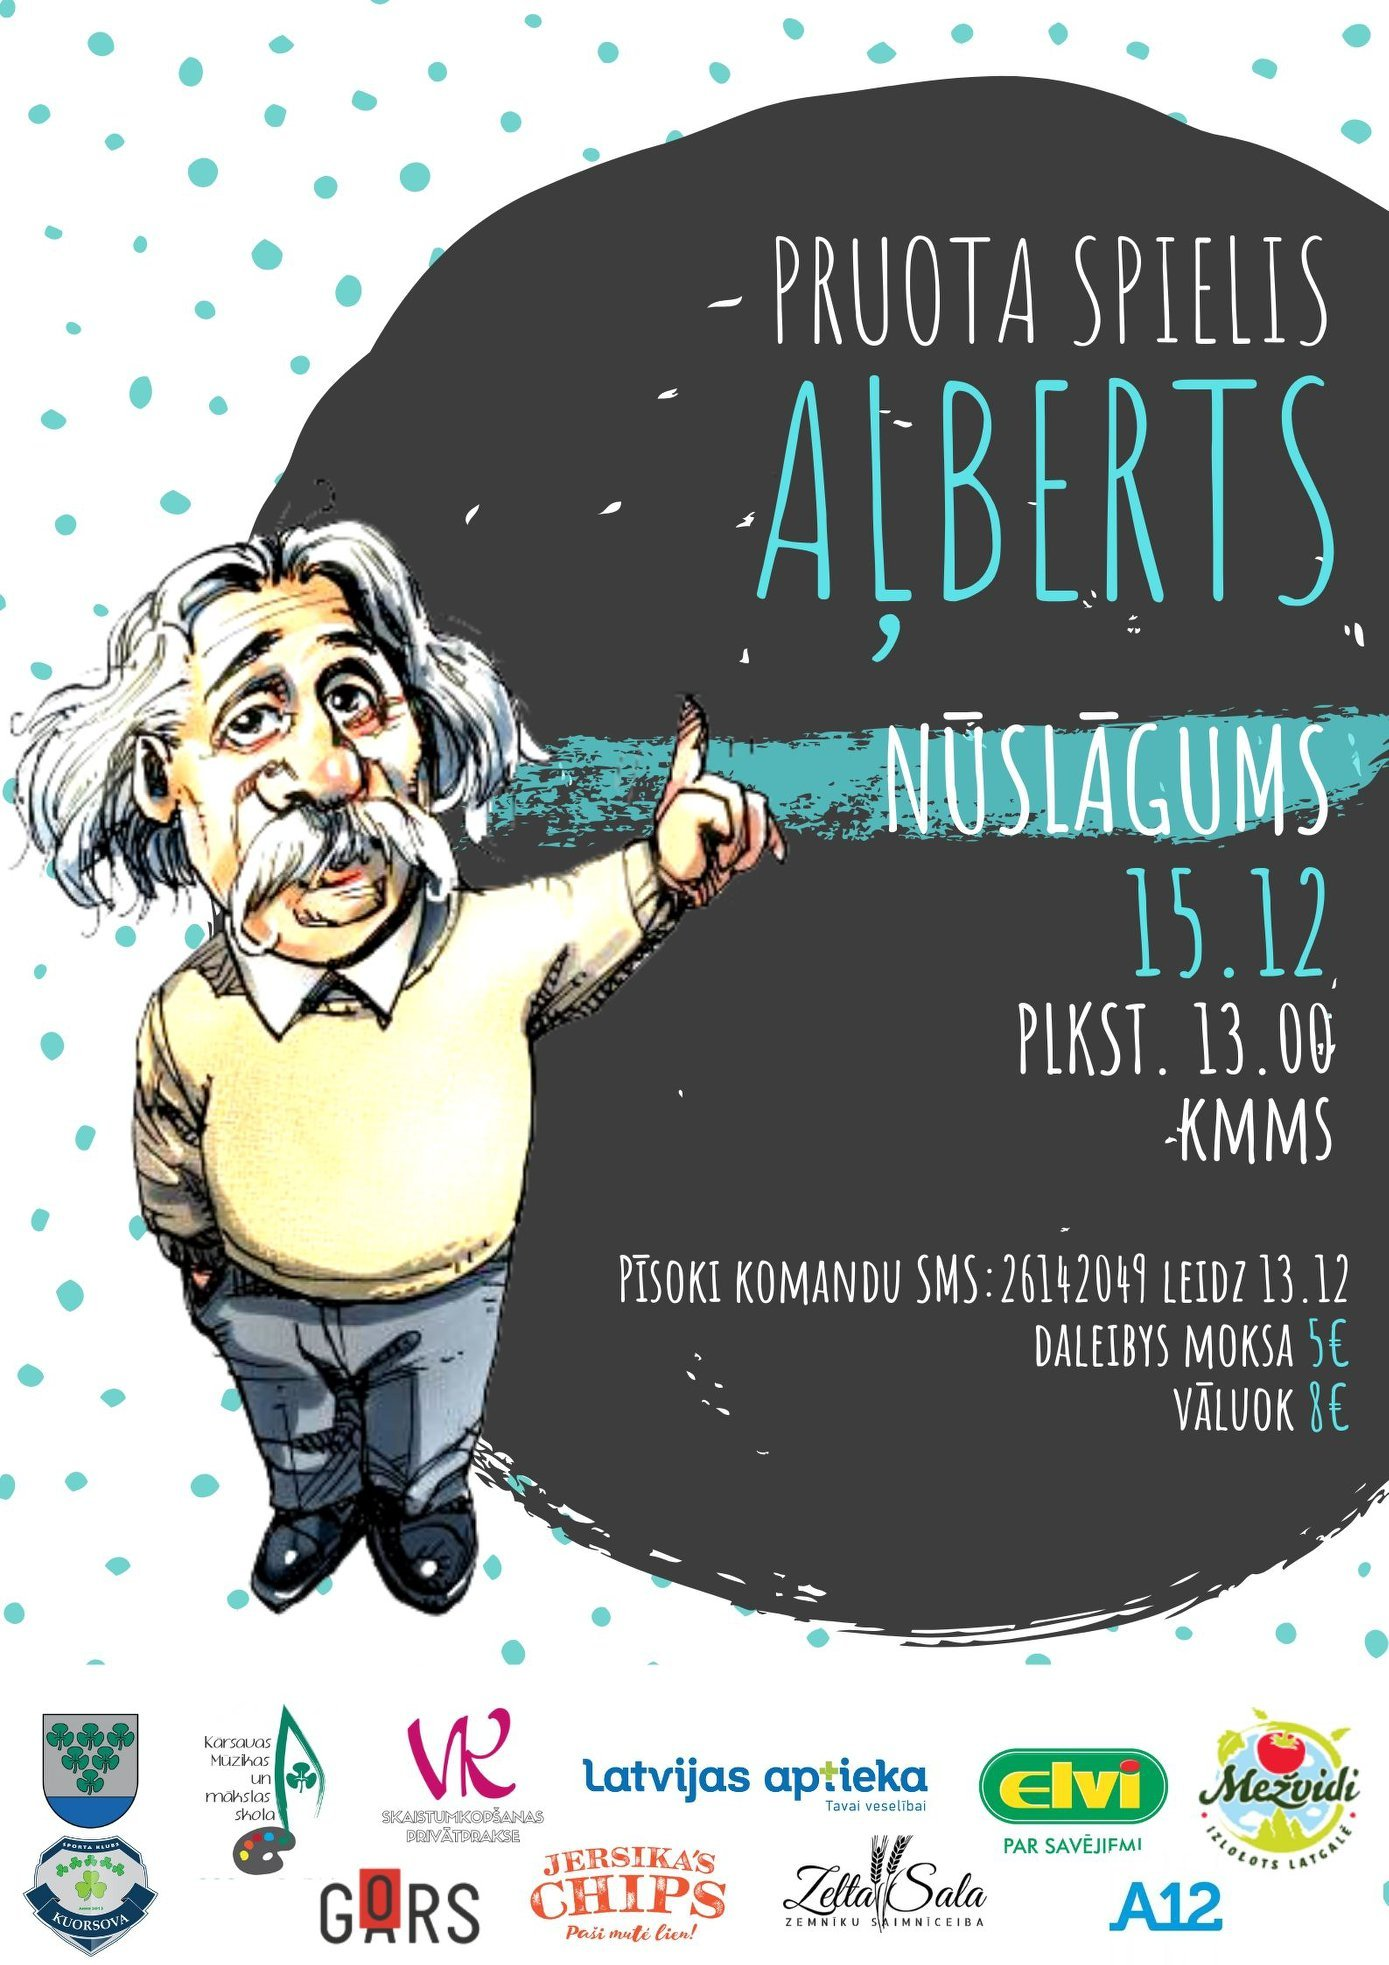 "Pruota spielis ""Aļberts"" @ Kuorsovys muzykys i muokslys škola"